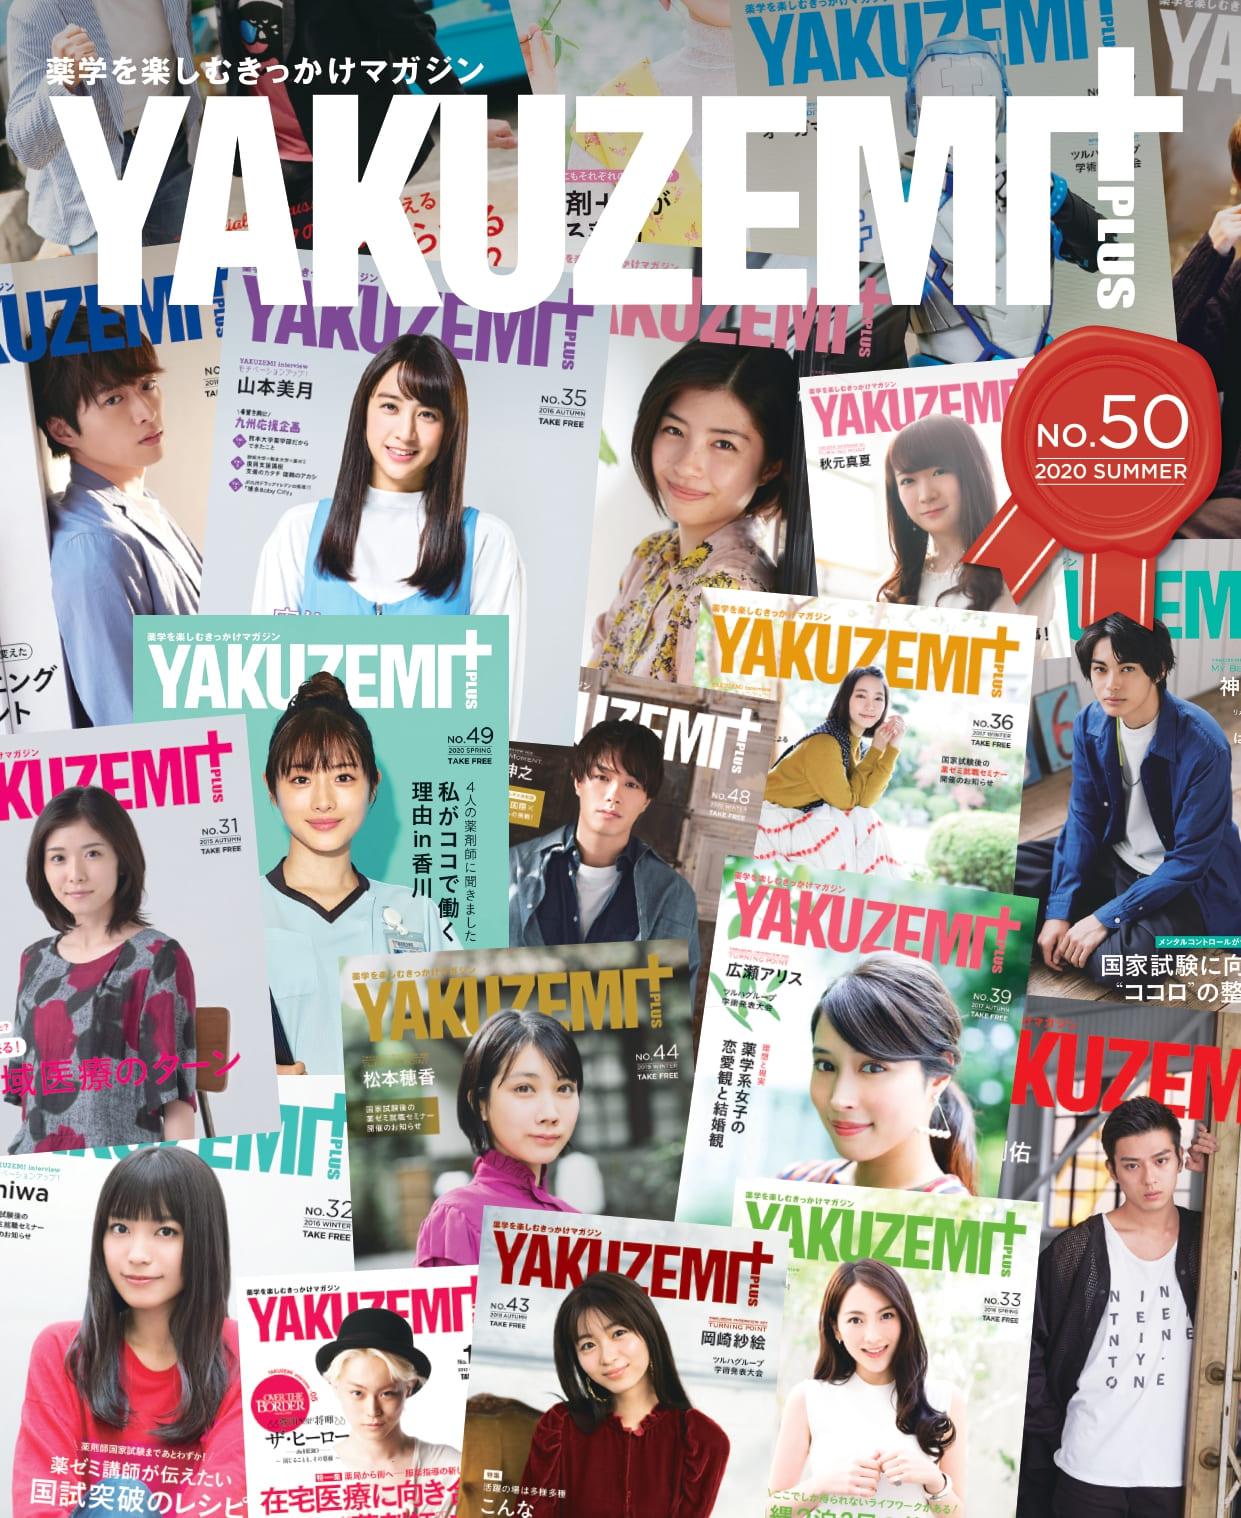 YAKUZEMI PLUS NO.50